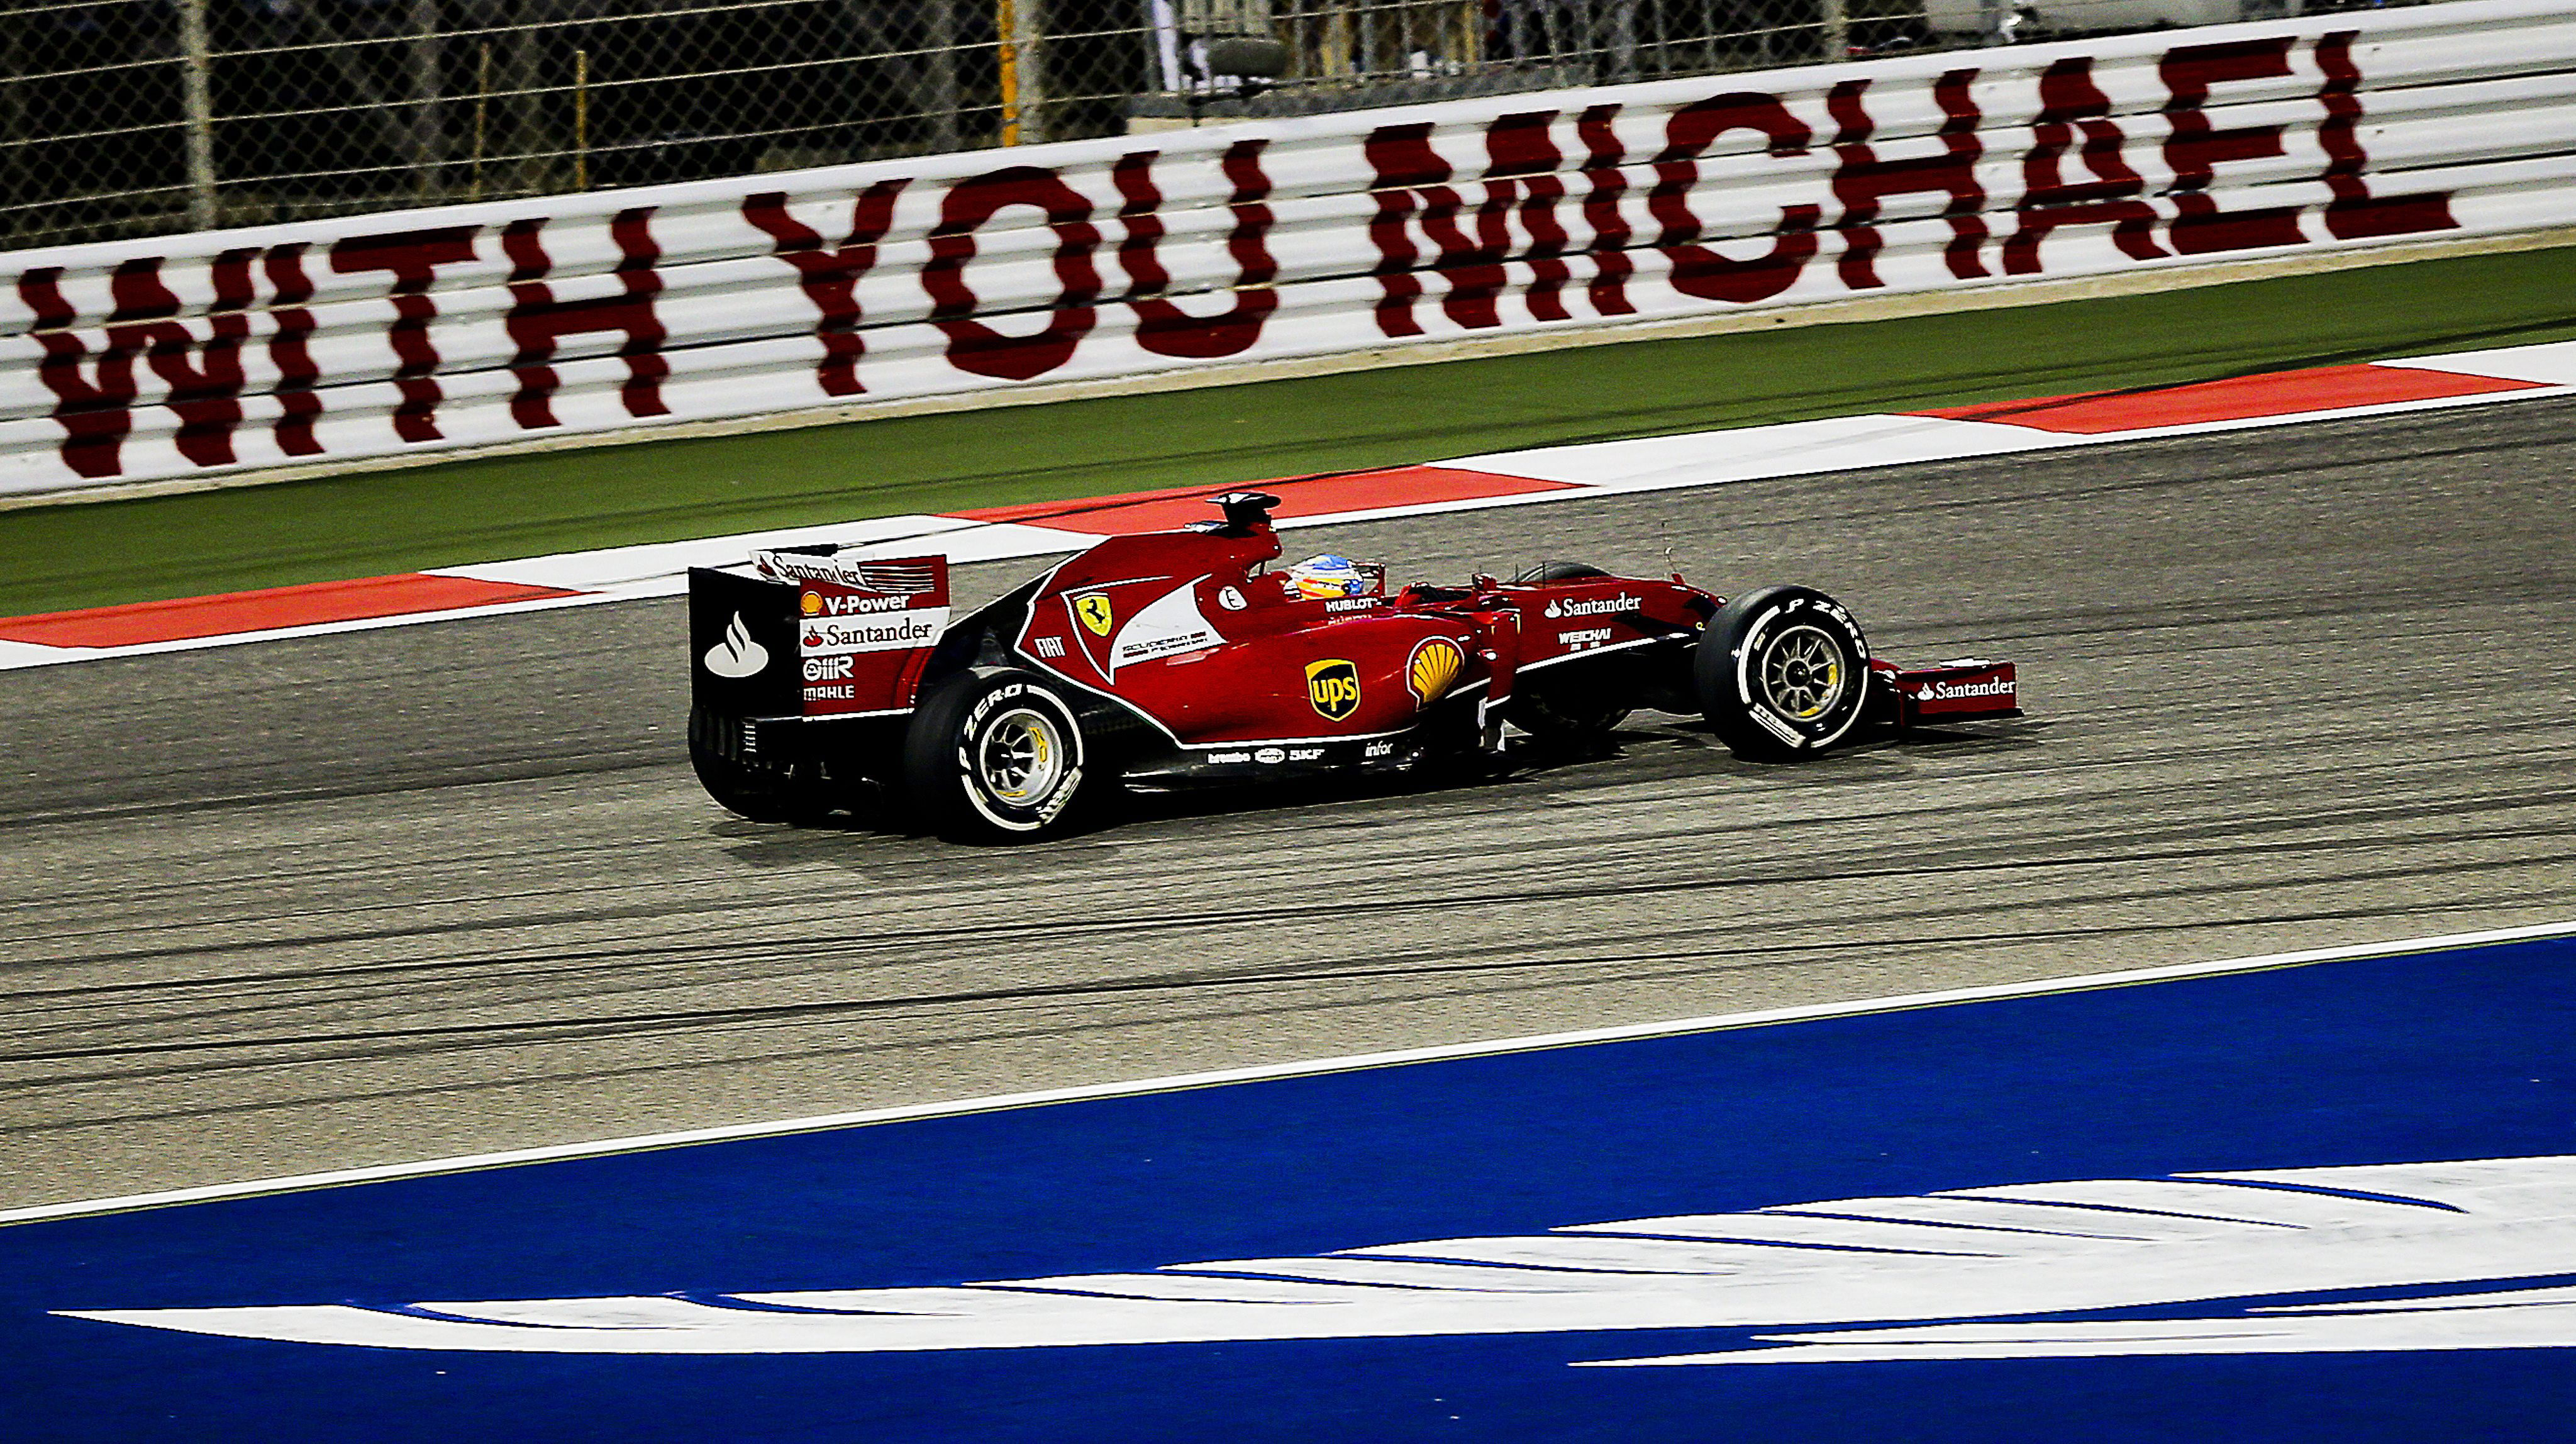 Doblete de Mercedes con Hamilton primero y Alonso noveno